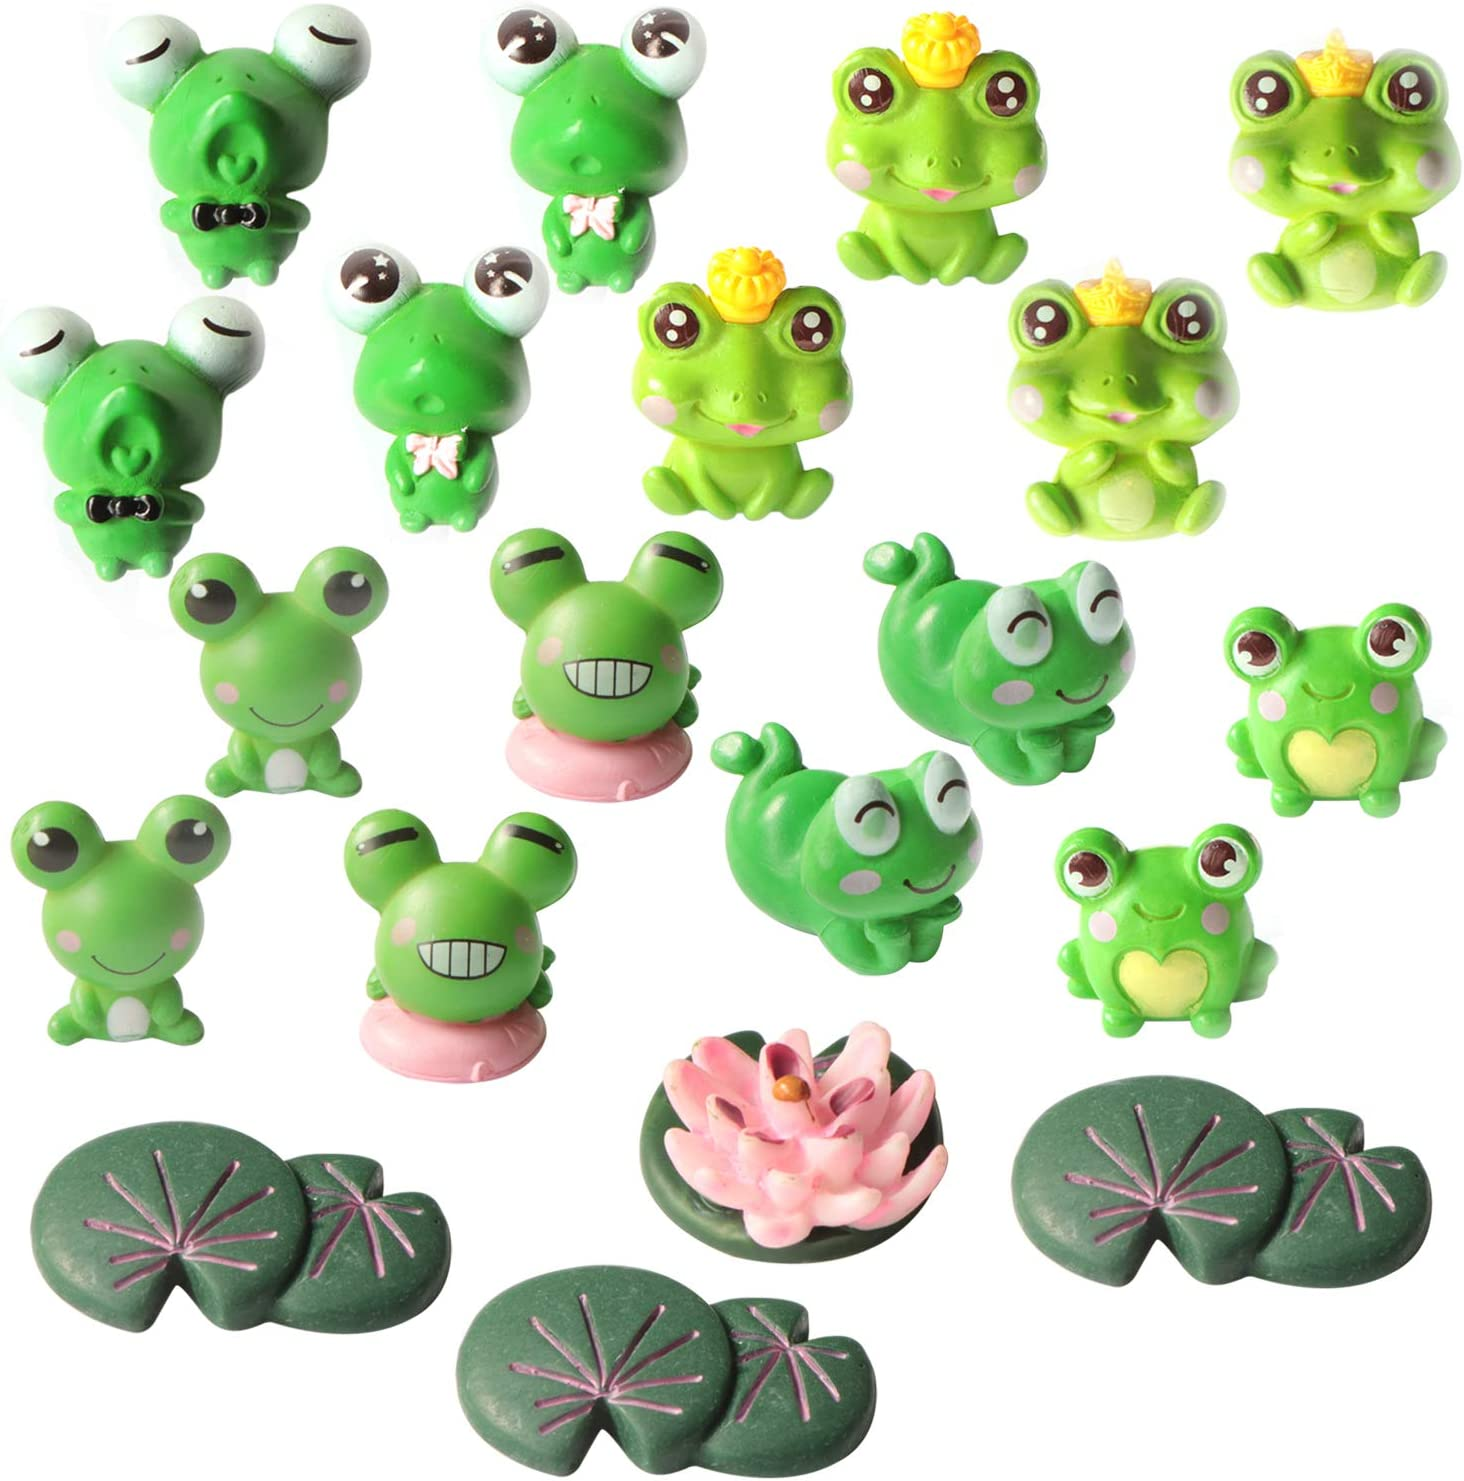 20 Pieces Cute Frog Miniature Figurines, SPWOLFRT Mini Garden Frog Ornaments Animals Model Fairy Garden Miniature Moss Landscape DIY Craft for Home Party Decoration (20)